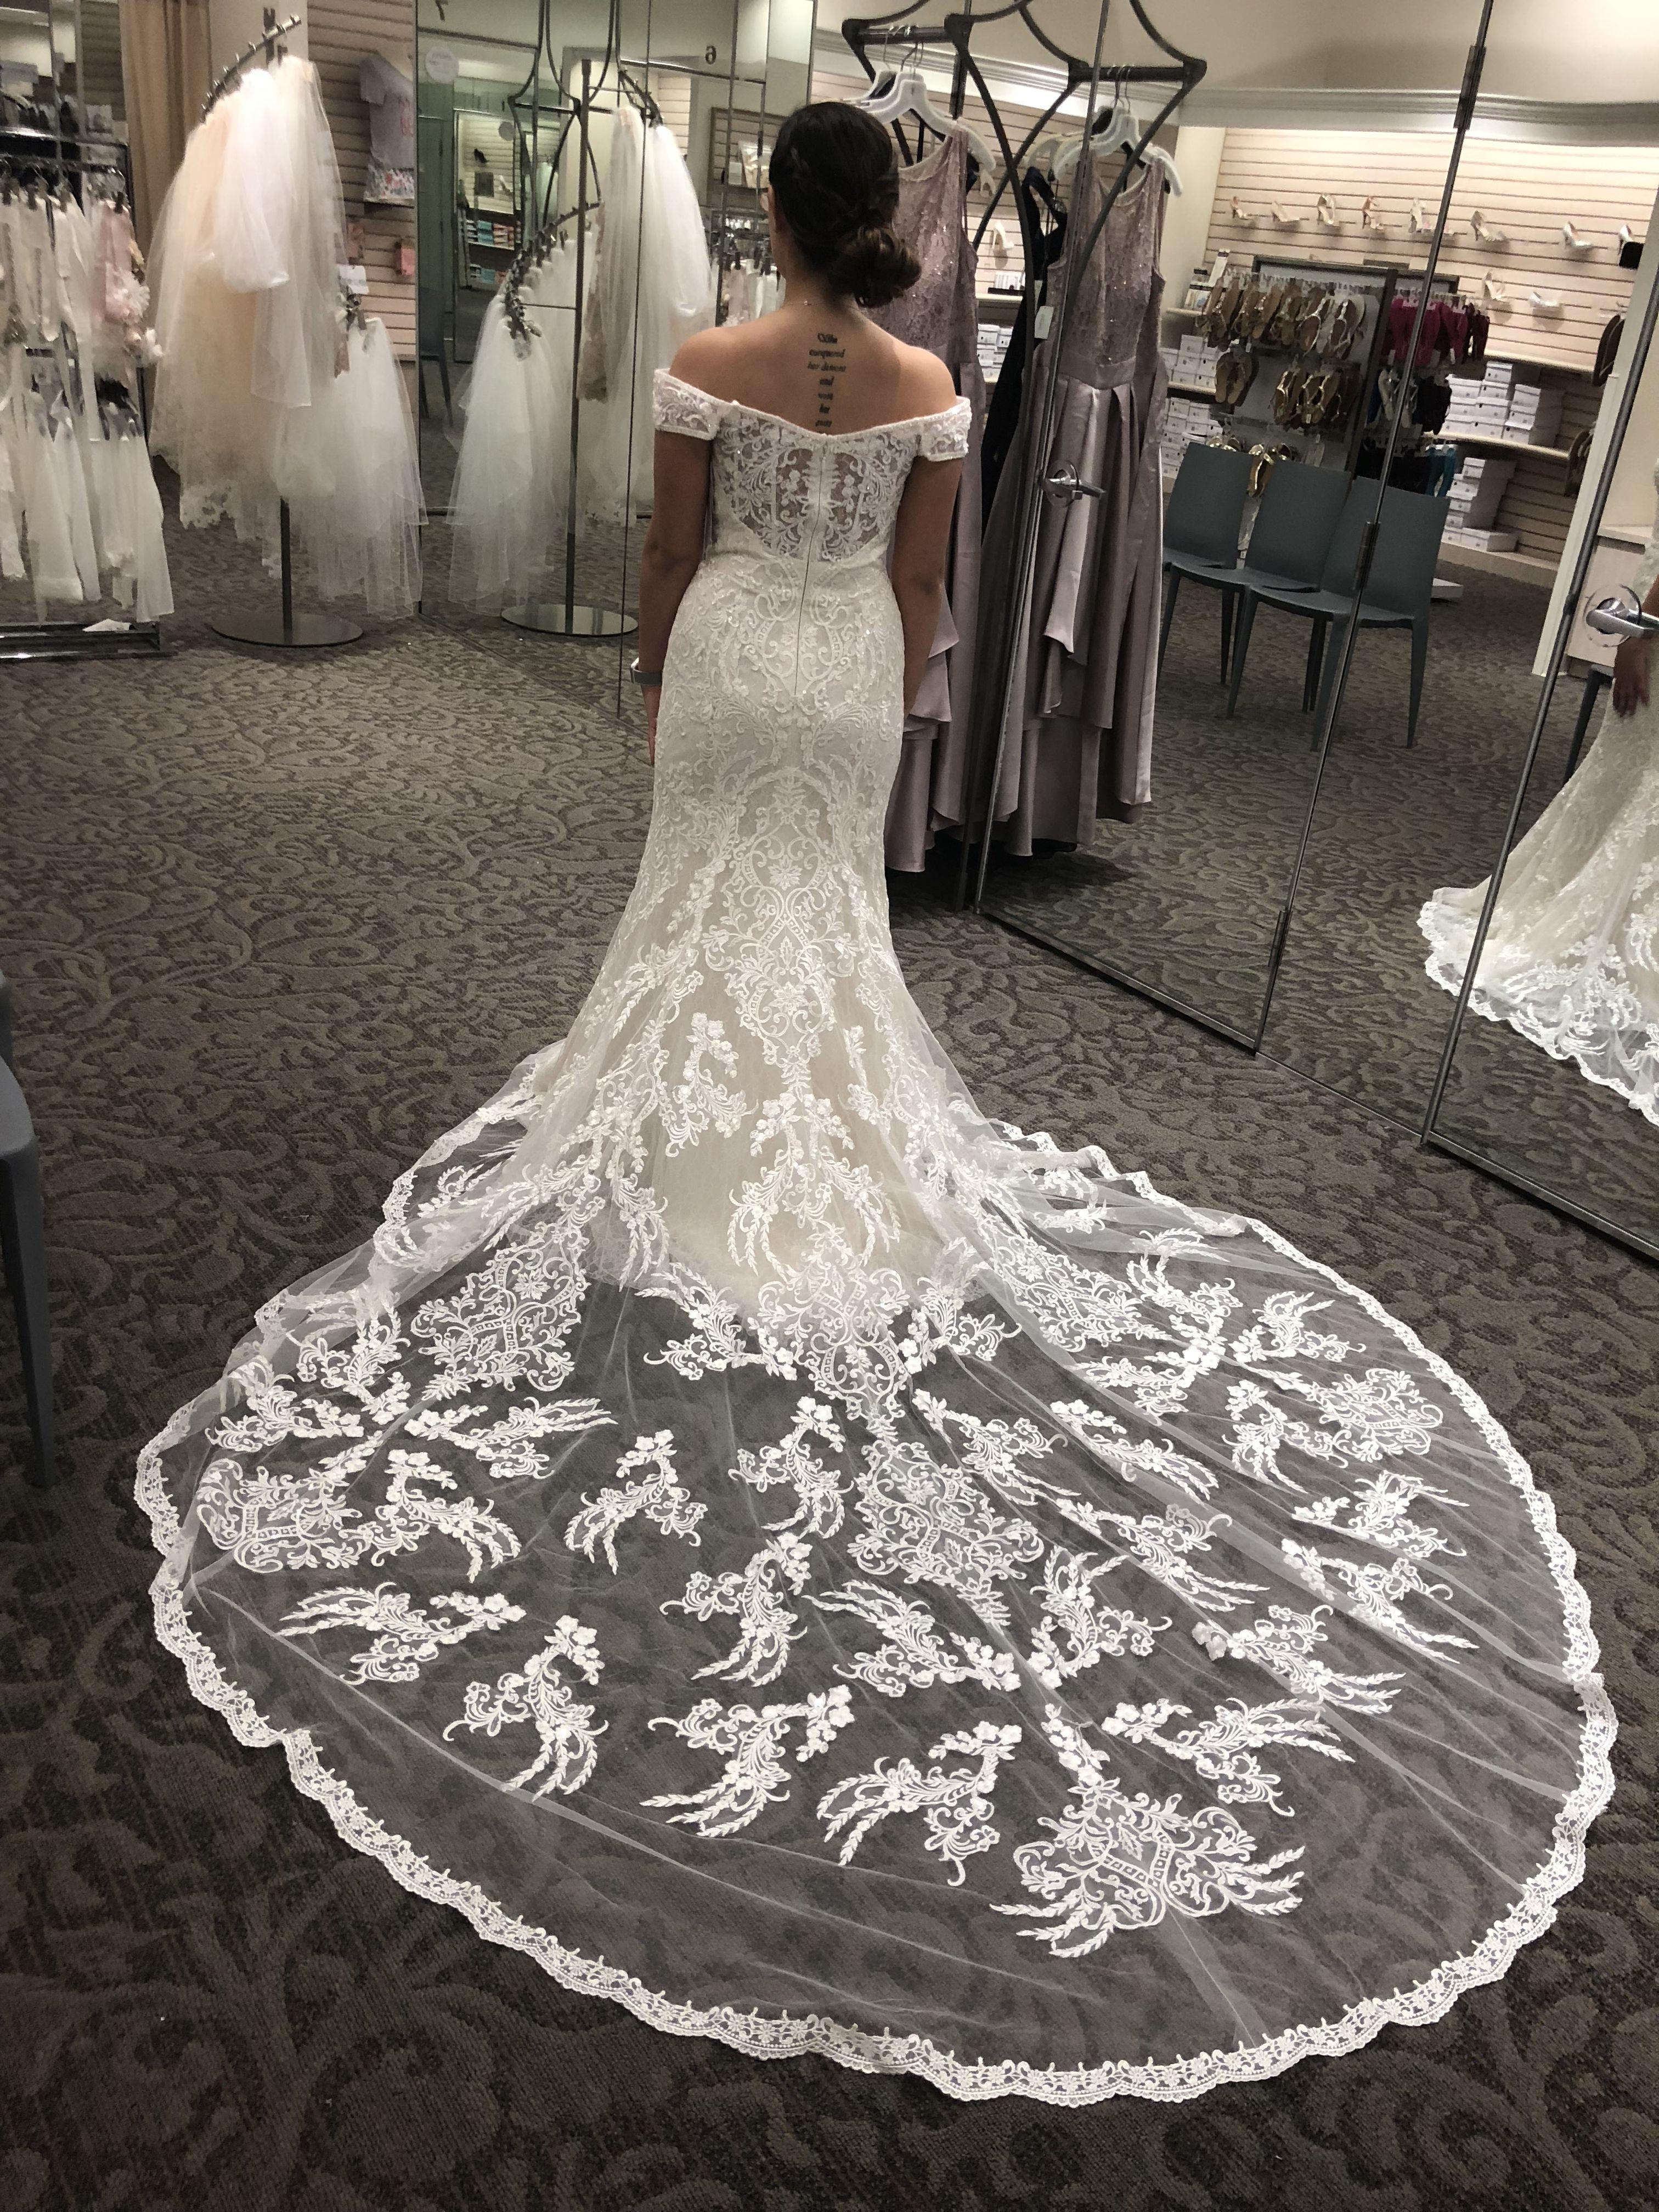 48+ Oleg cassini wedding dress ideas ideas in 2021